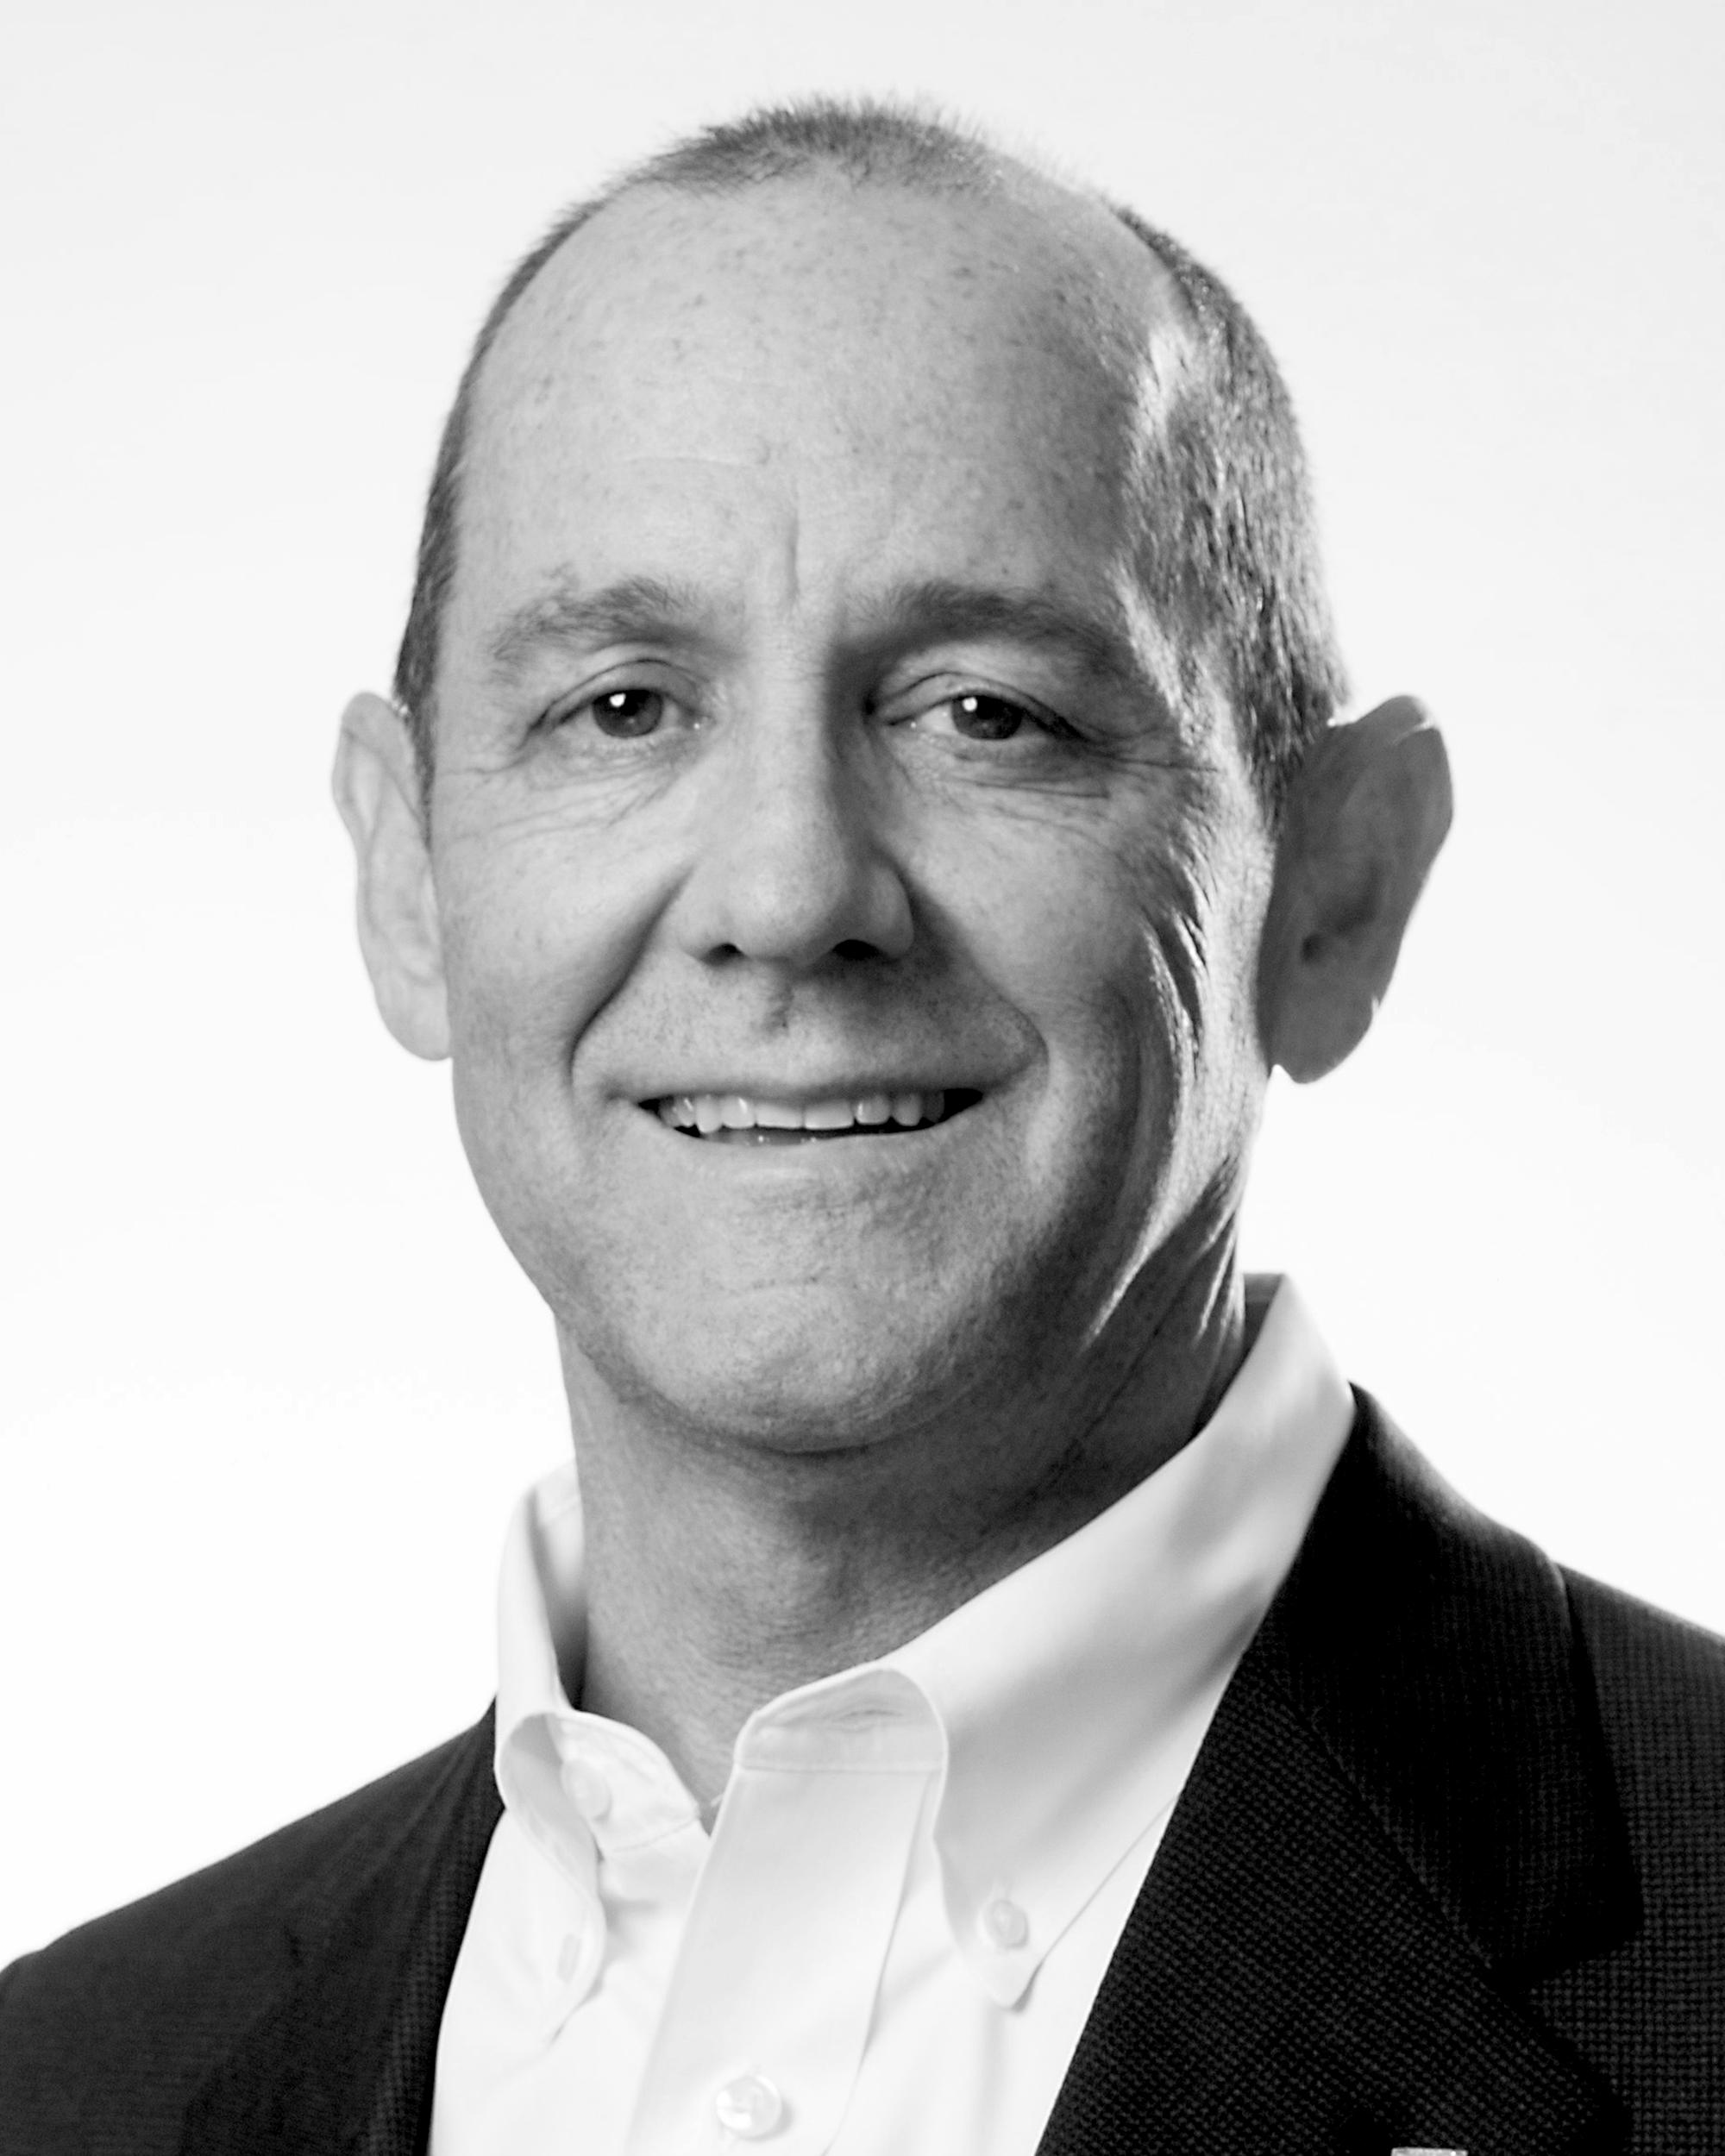 Headshot of David Valerius